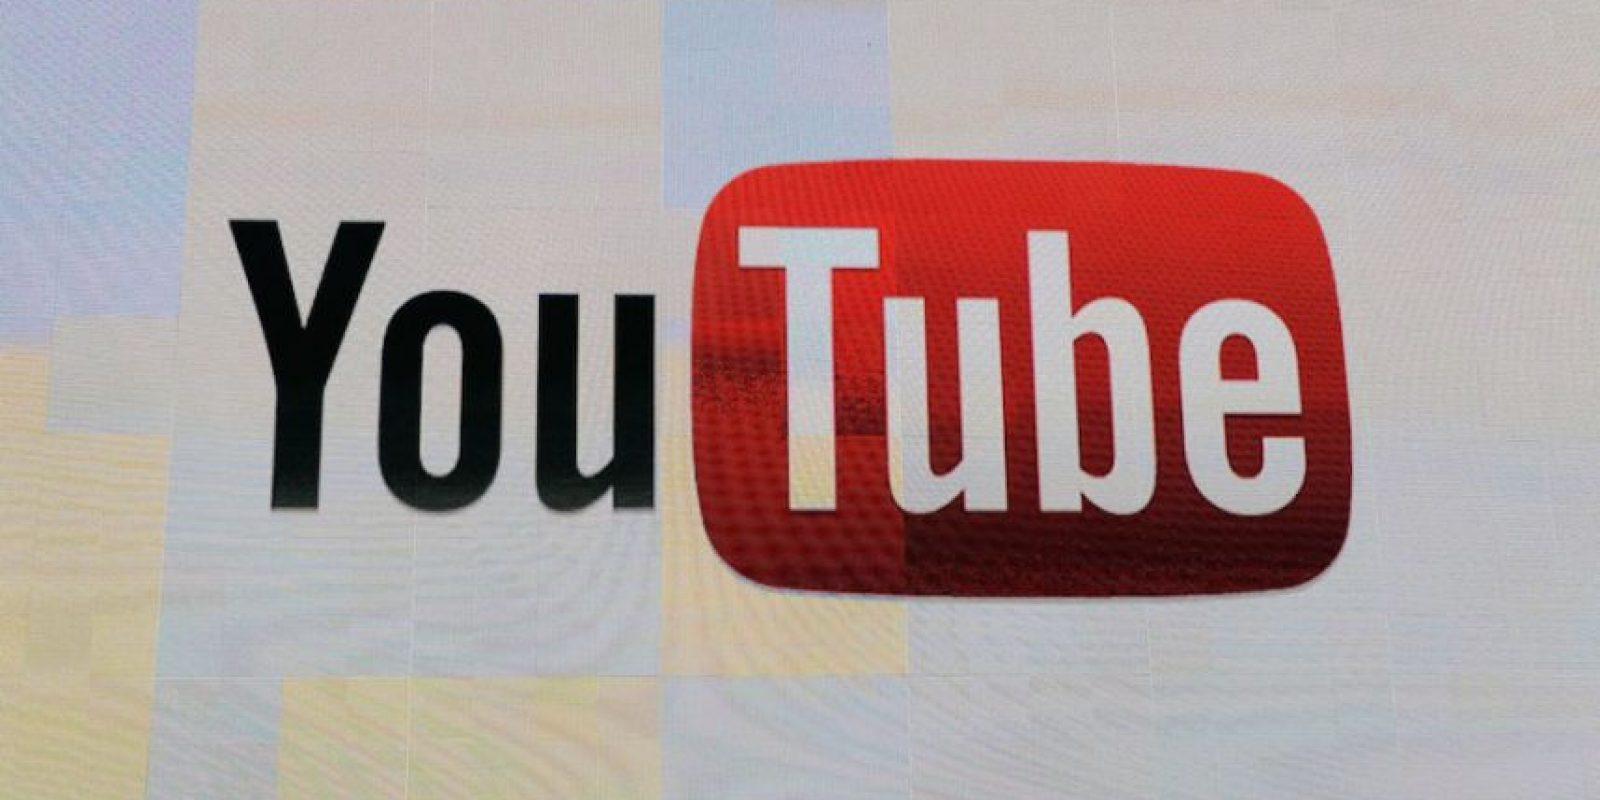 Jawed Karim, Steve Chen y Chad Hurley son los fundadores de YouTube. Foto:Getty Images